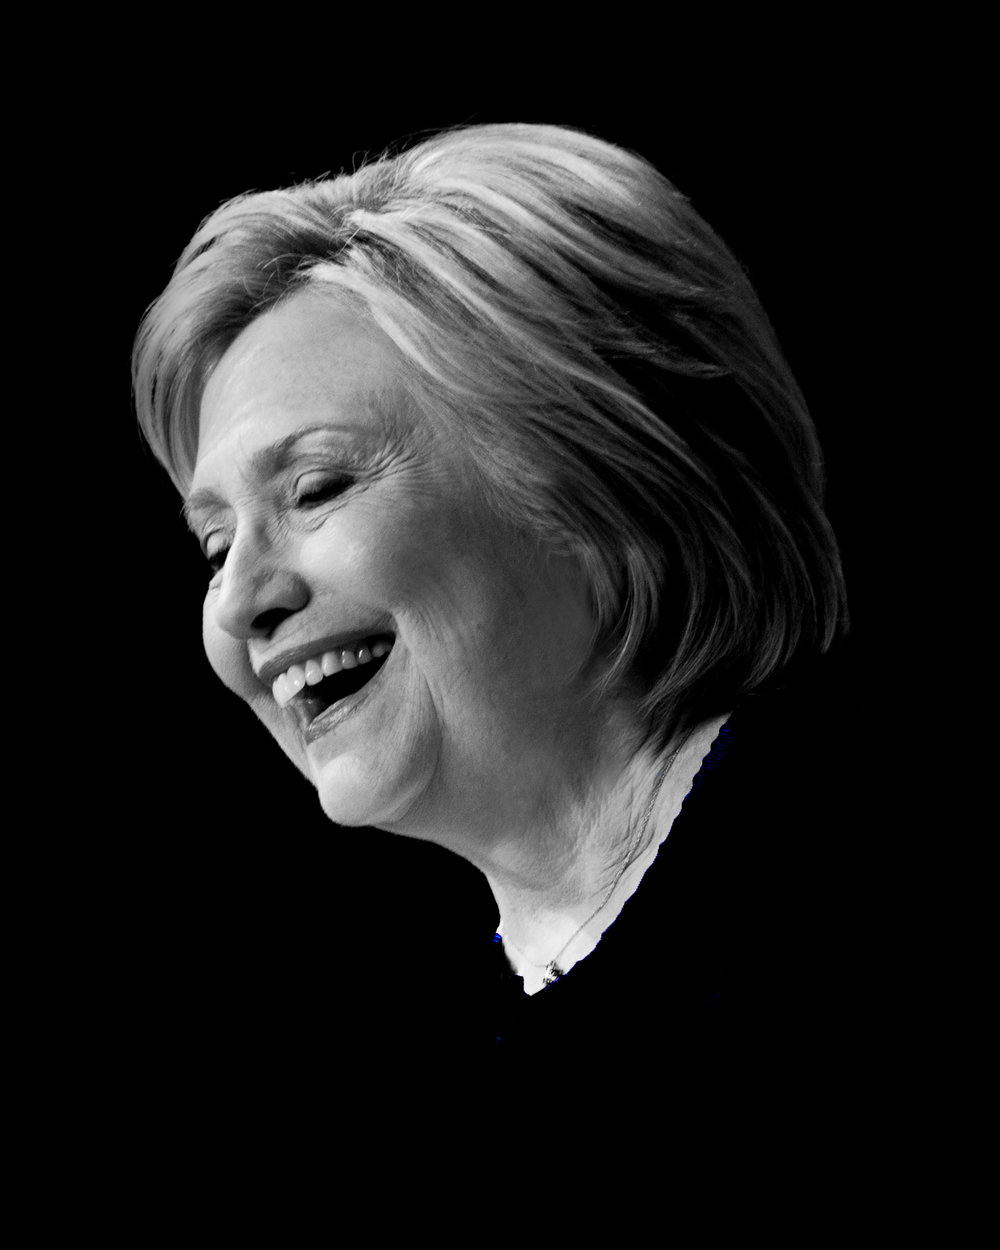 Hillary Clinton Portrait 23